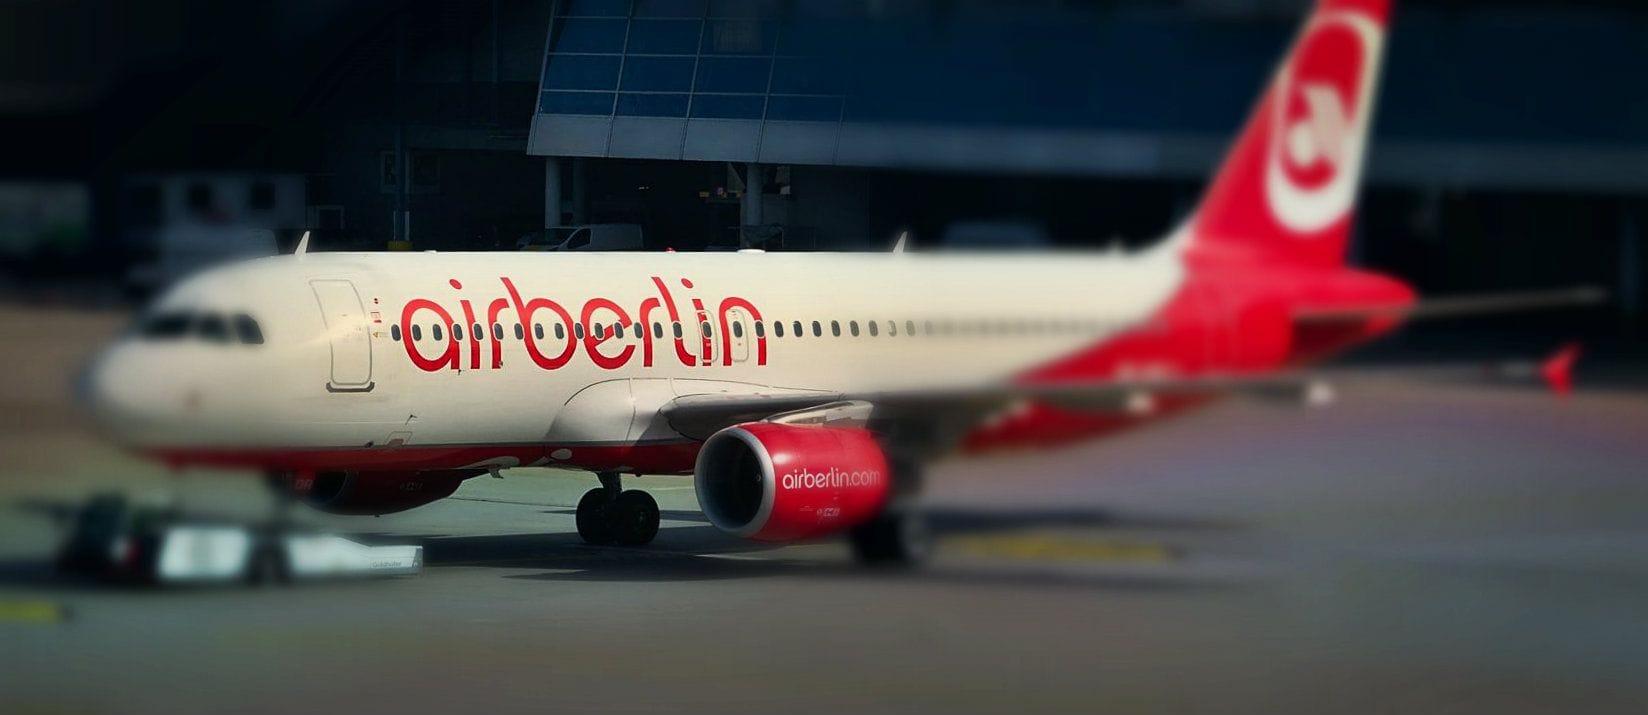 Air Berlin, Insolvenz, Bankrott, Zukunft ungewiss